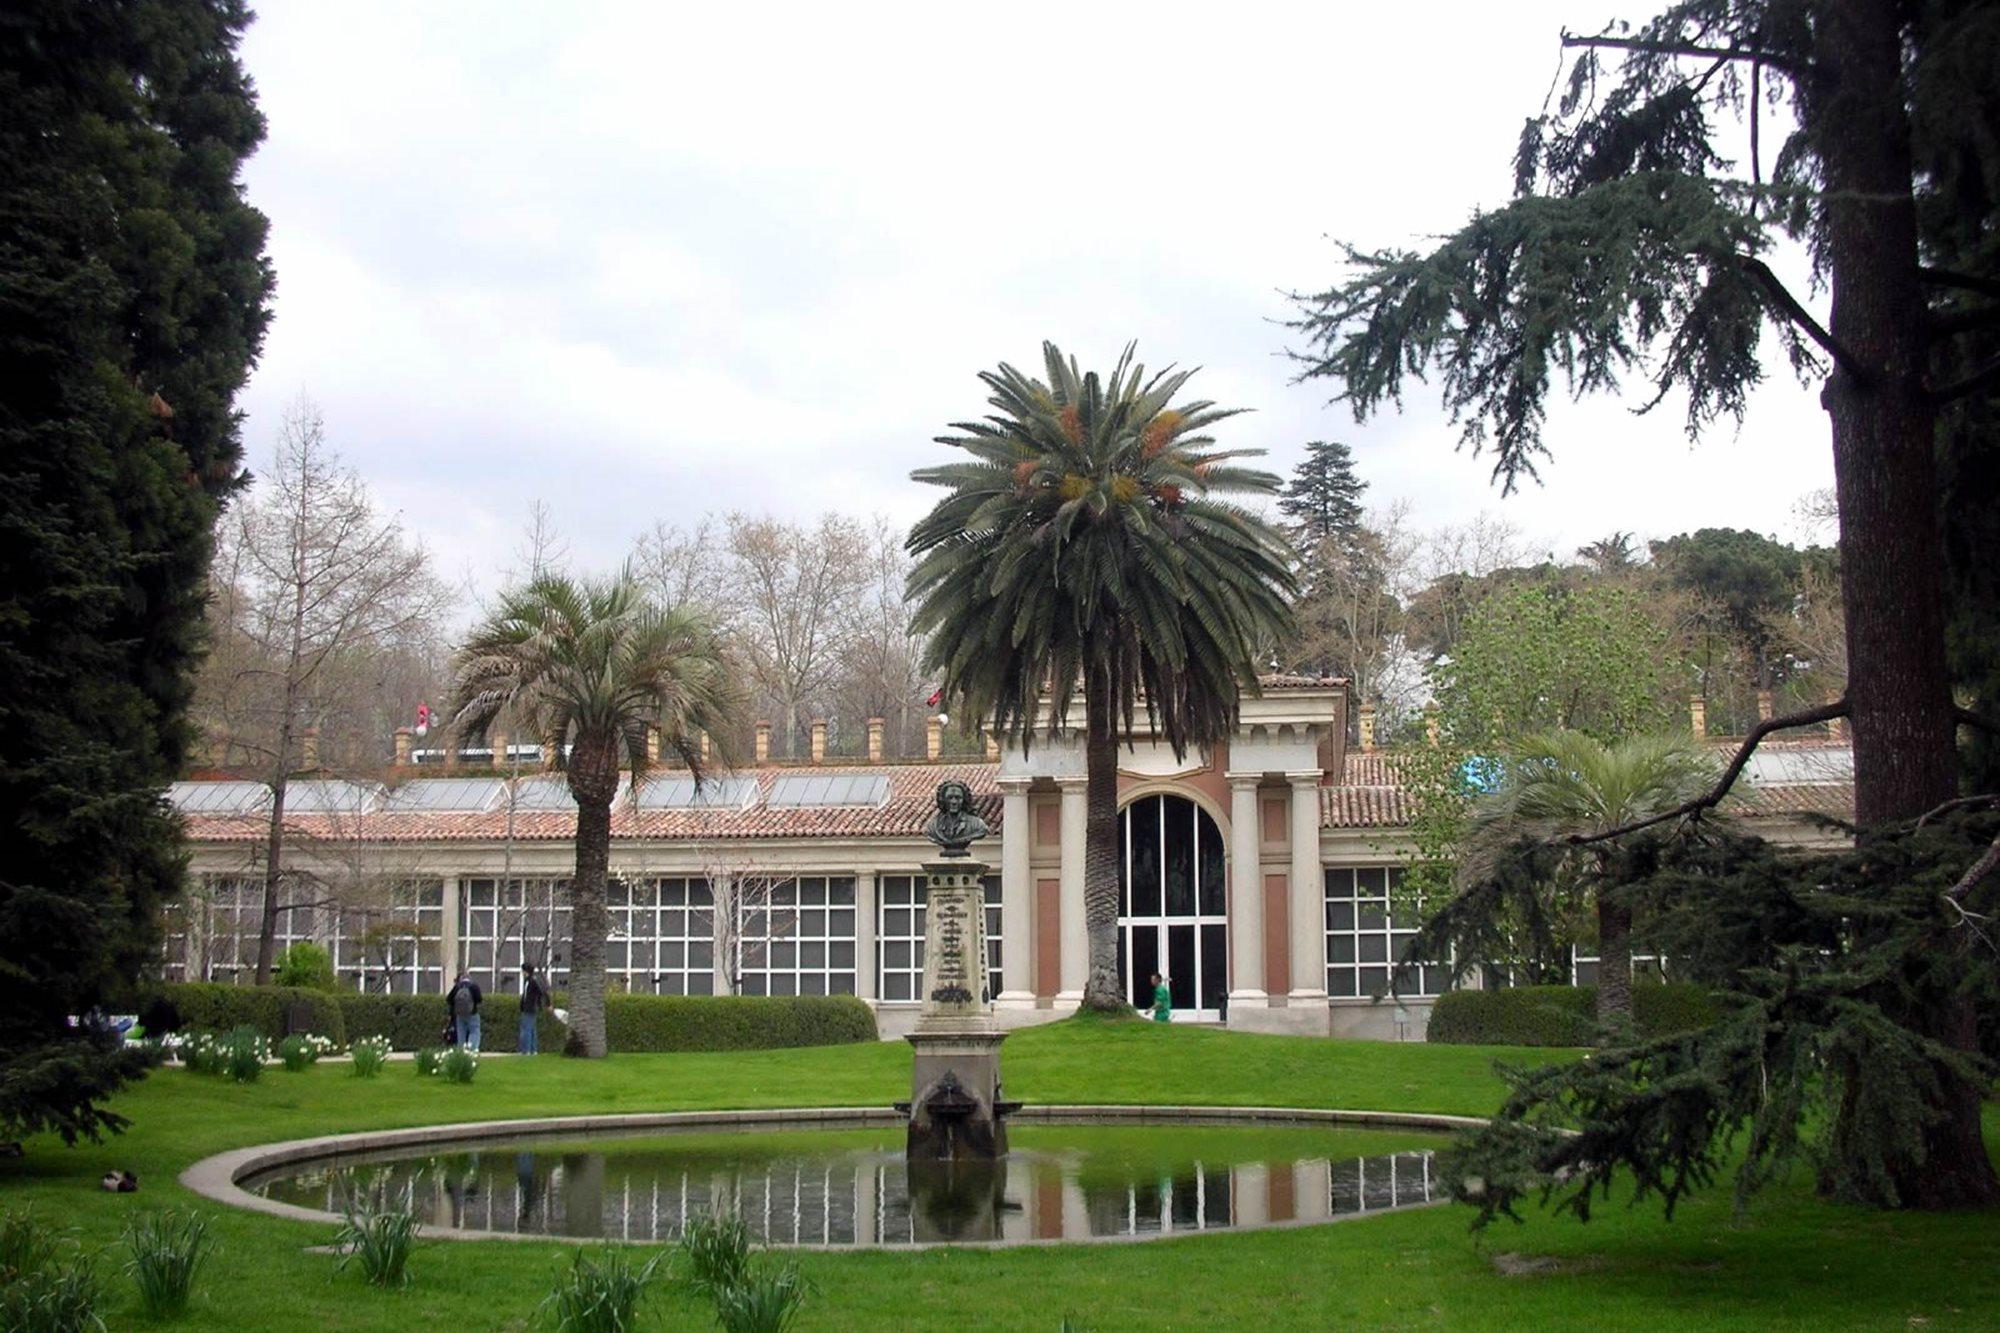 22. REAL JARDÍN BOTÁNICO (MADRID)